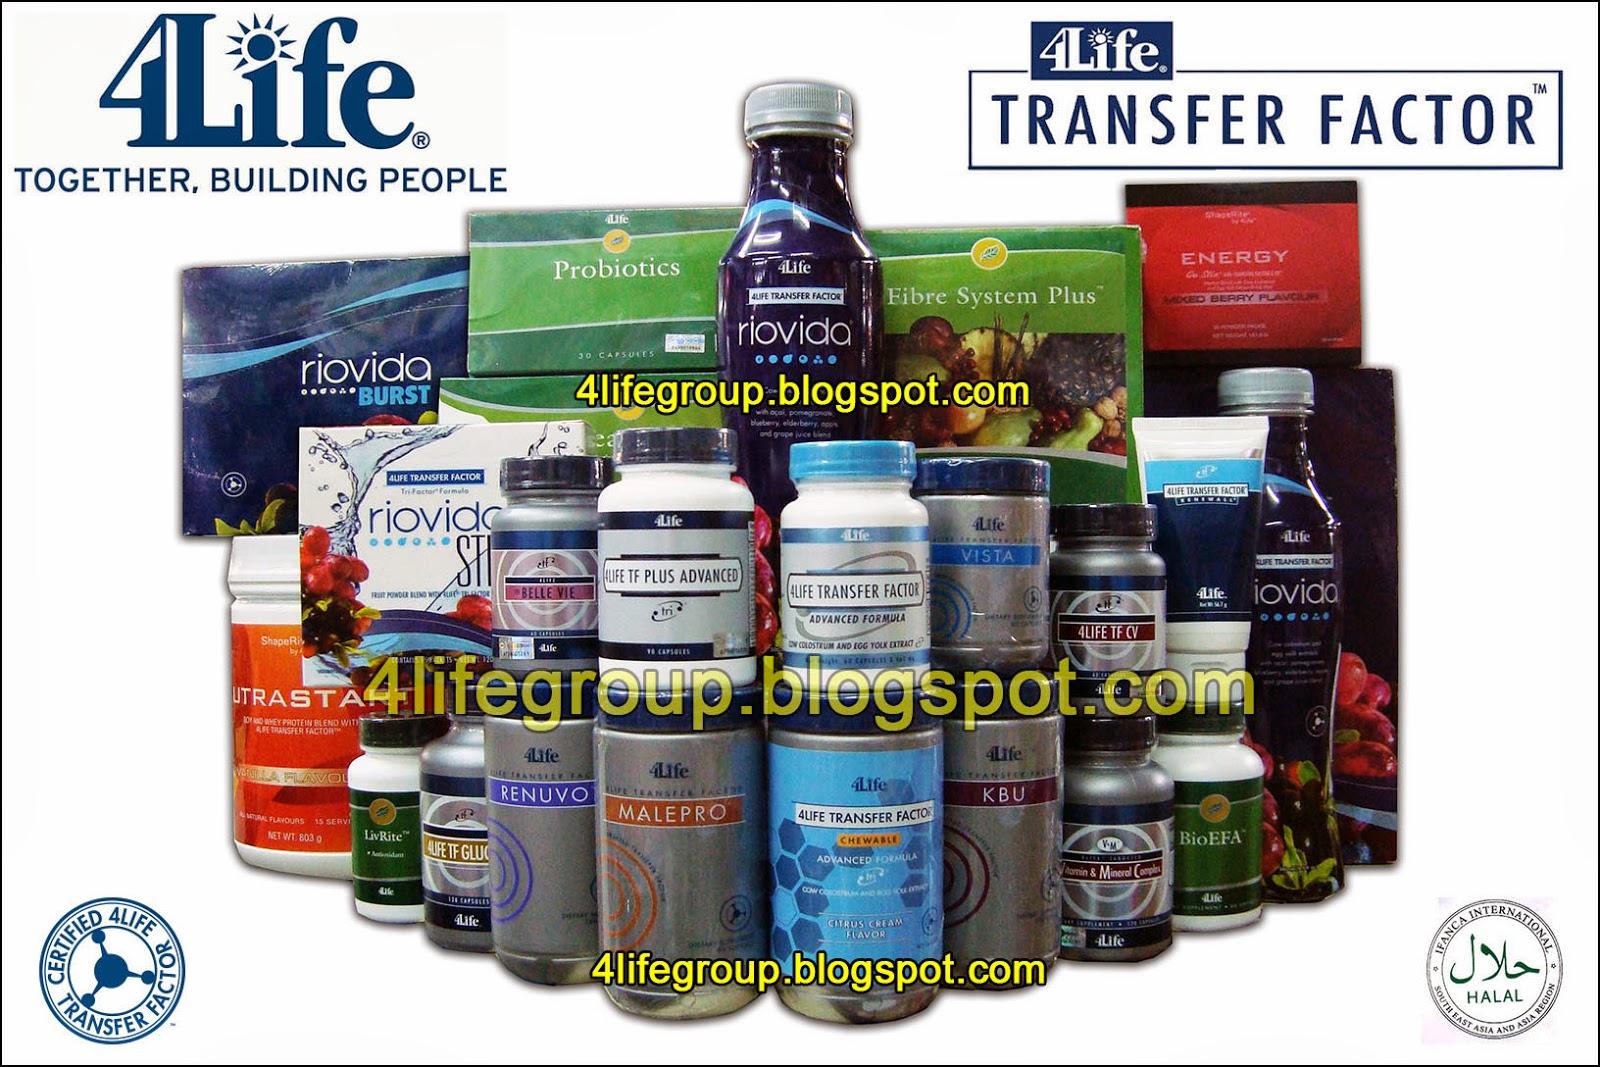 foto Produk 4Life Transfer Factor